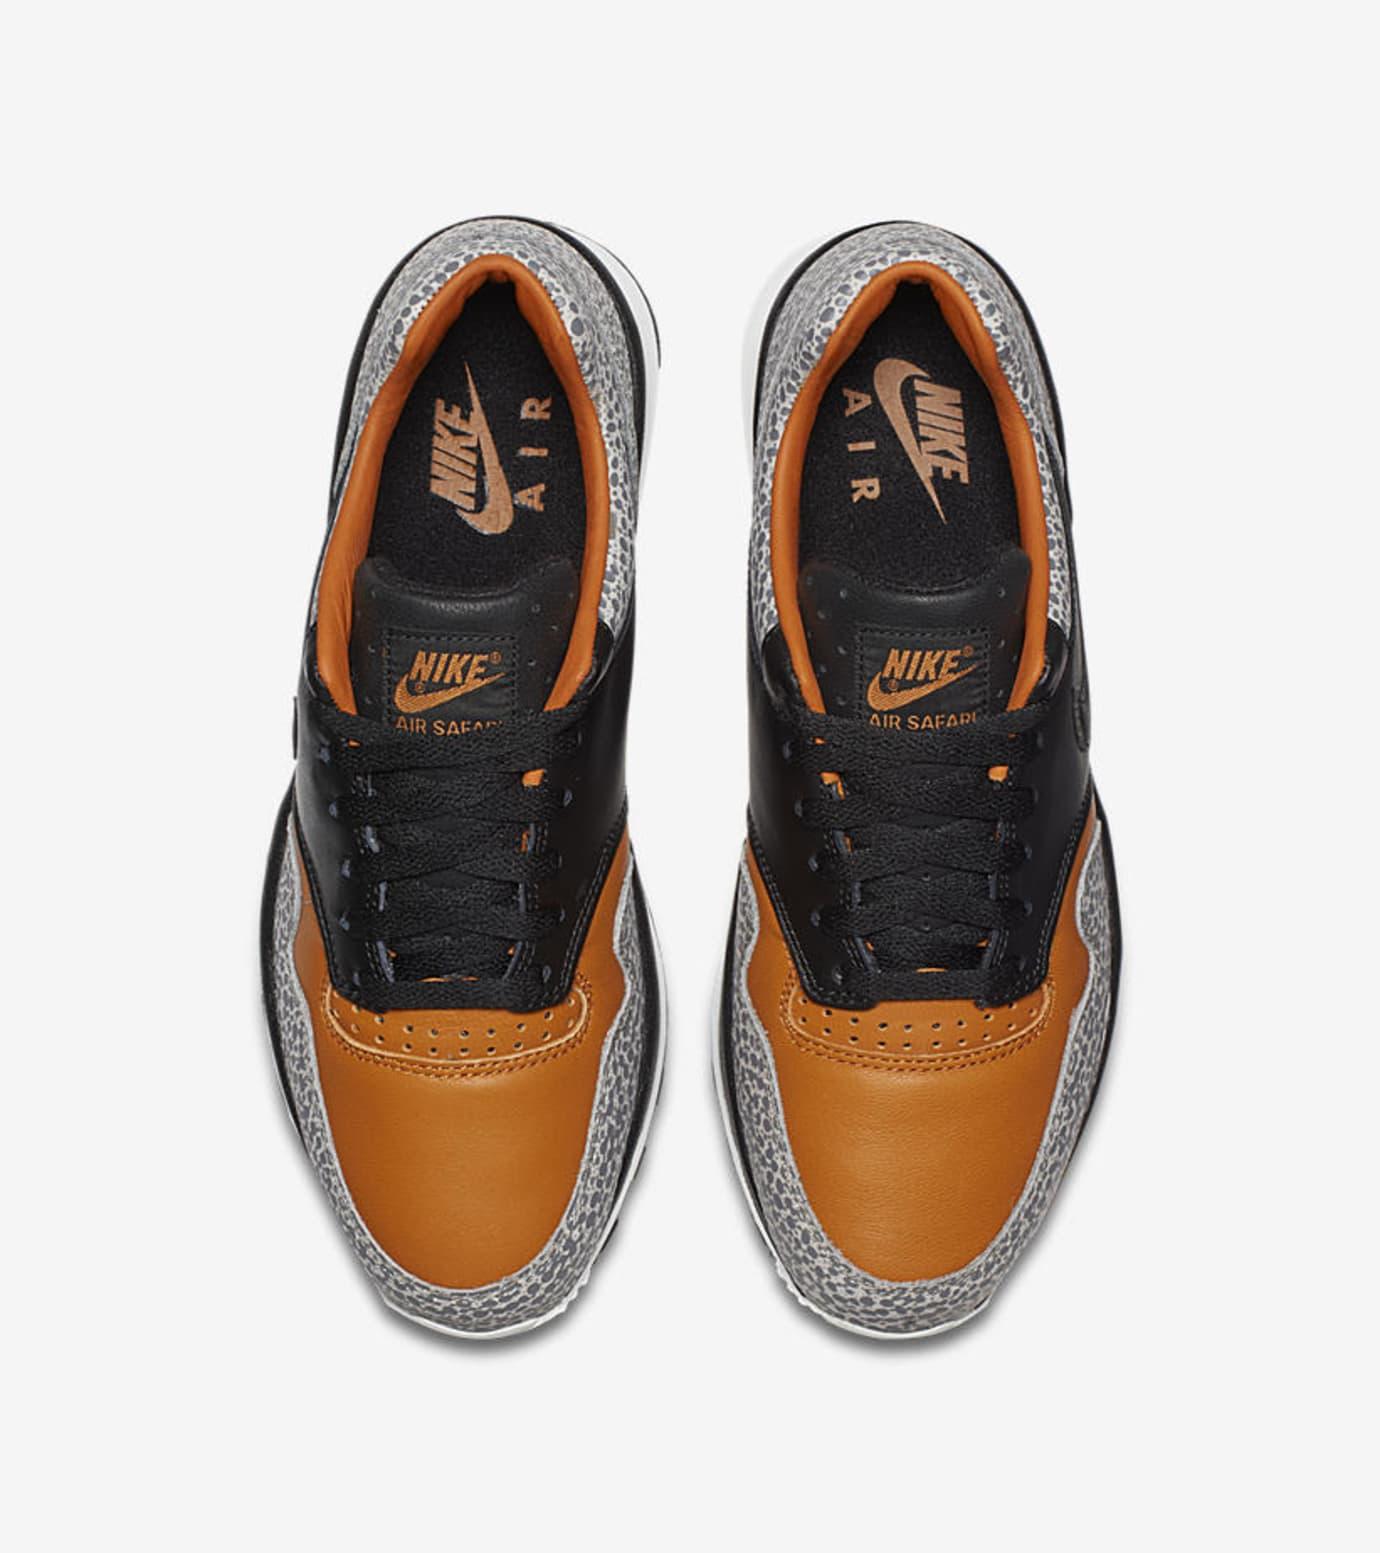 cc5539a33b Nike Air Safari AO3295-001 AO3295-002 Release Date | Sole Collector